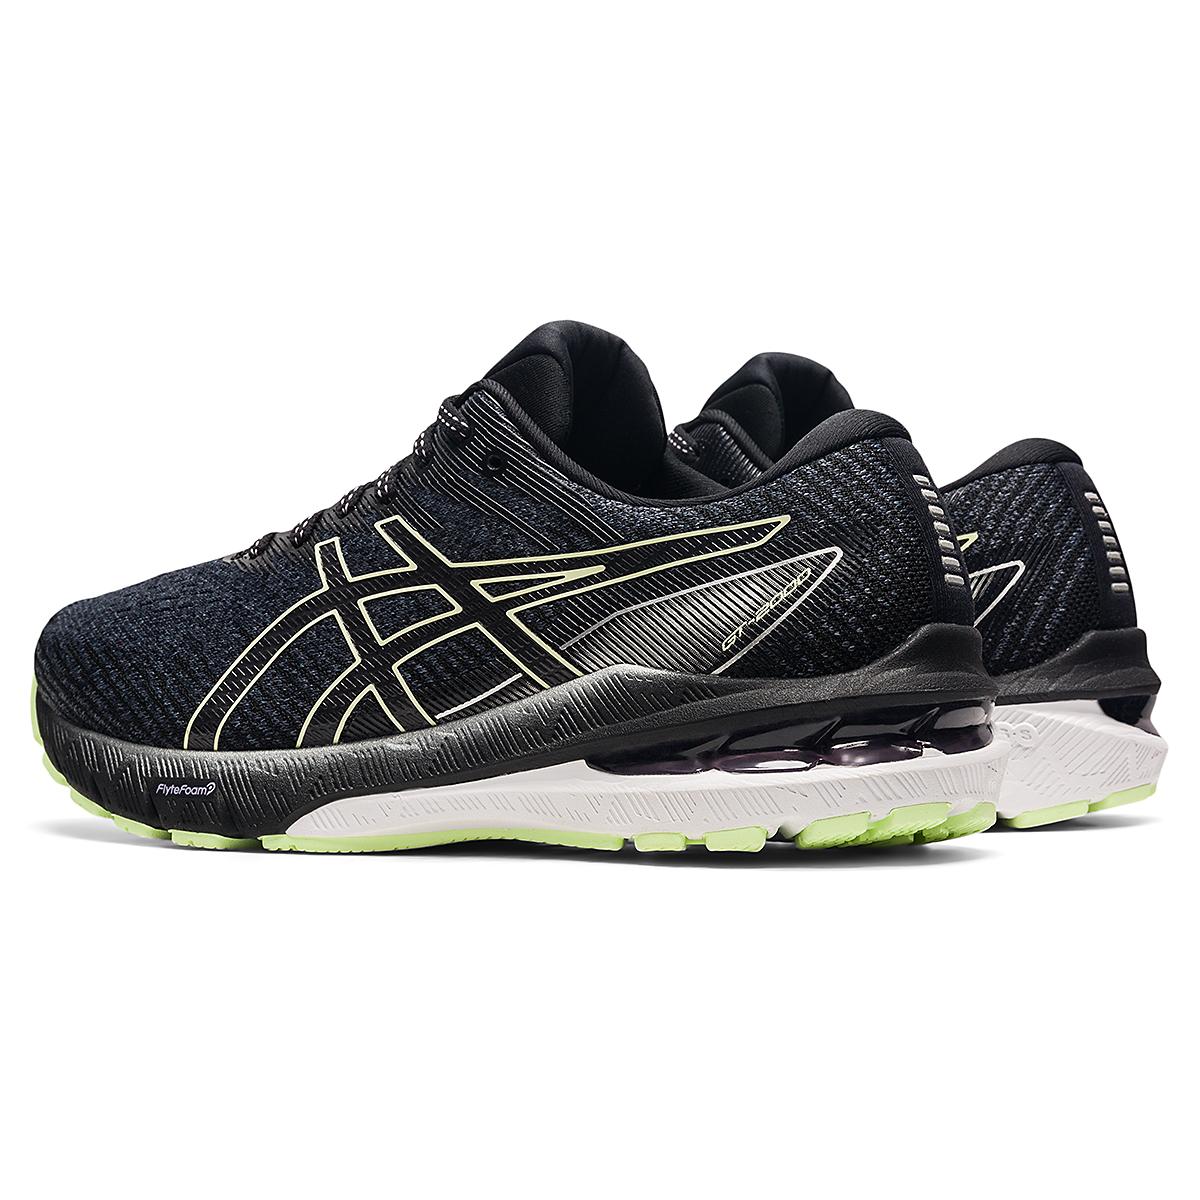 Women's Asics GT-2000 10 Running Shoe - Color: Soft Lavender/Black - Size: 5 - Width: Wide, Soft Lavender/Black, large, image 4